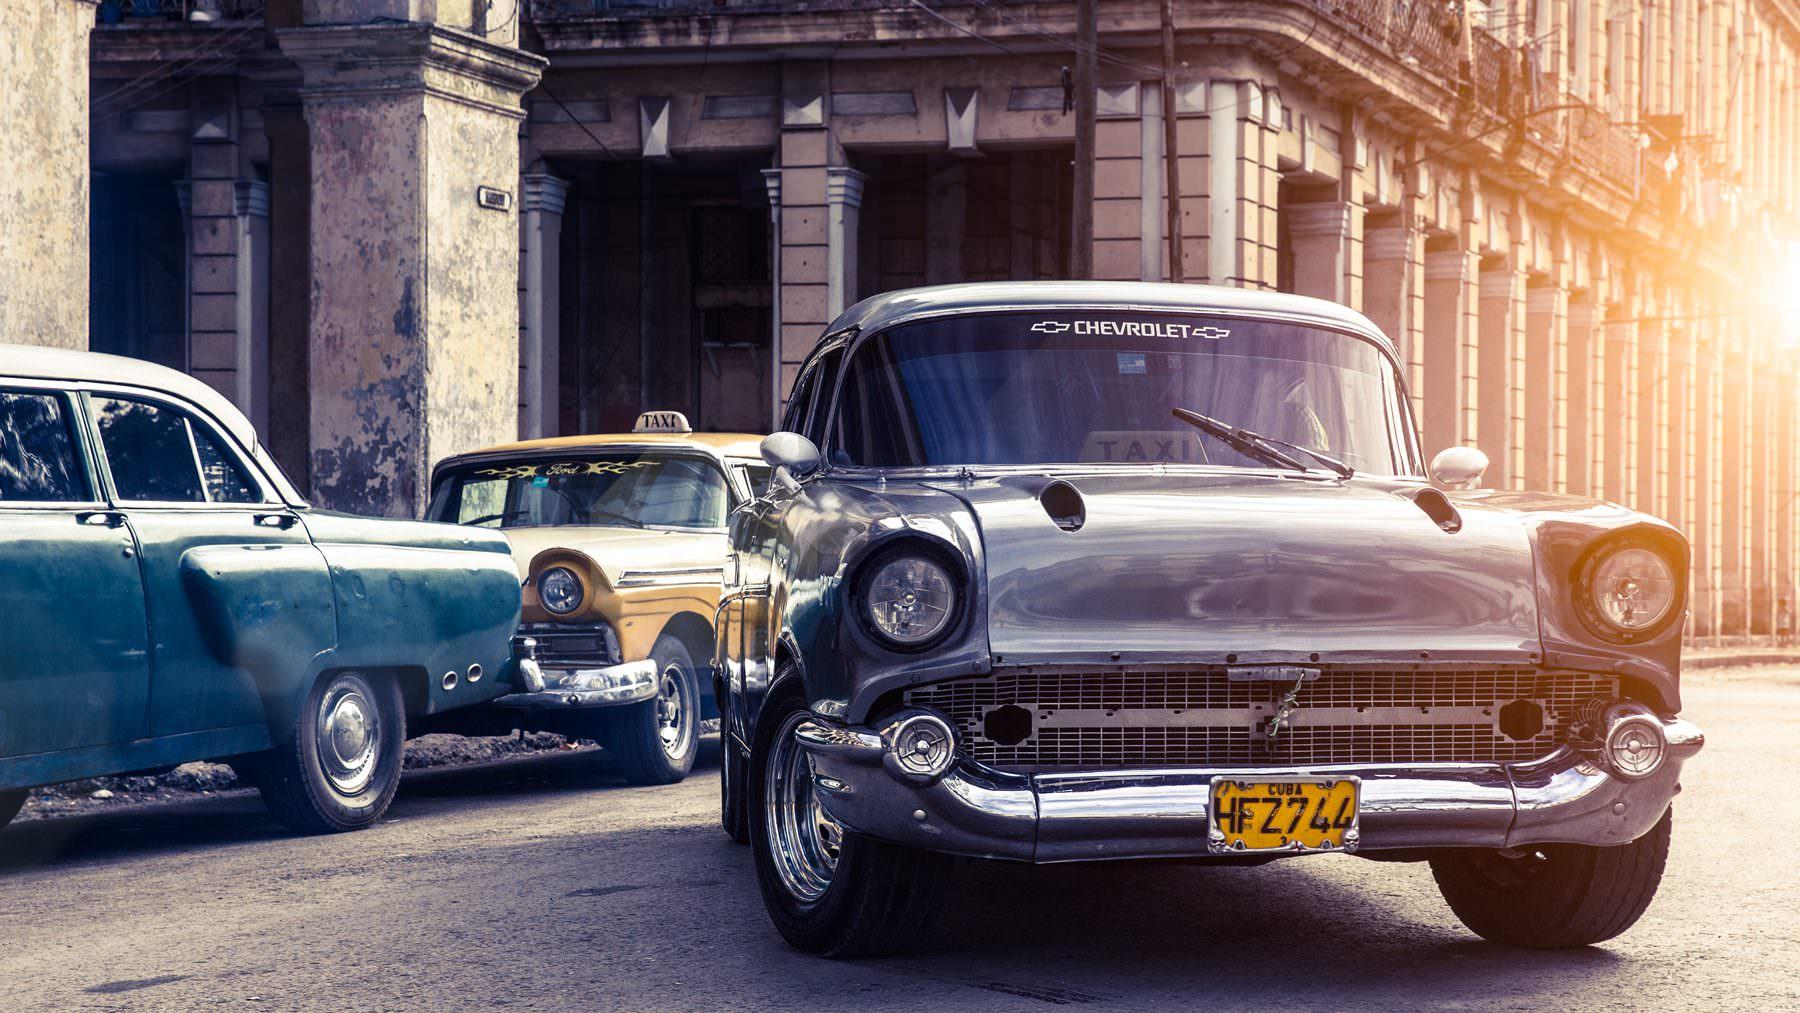 Cuba - Havanna - Habana Vieja - Street Scene with old cars Copyright © by Gerry Pacher